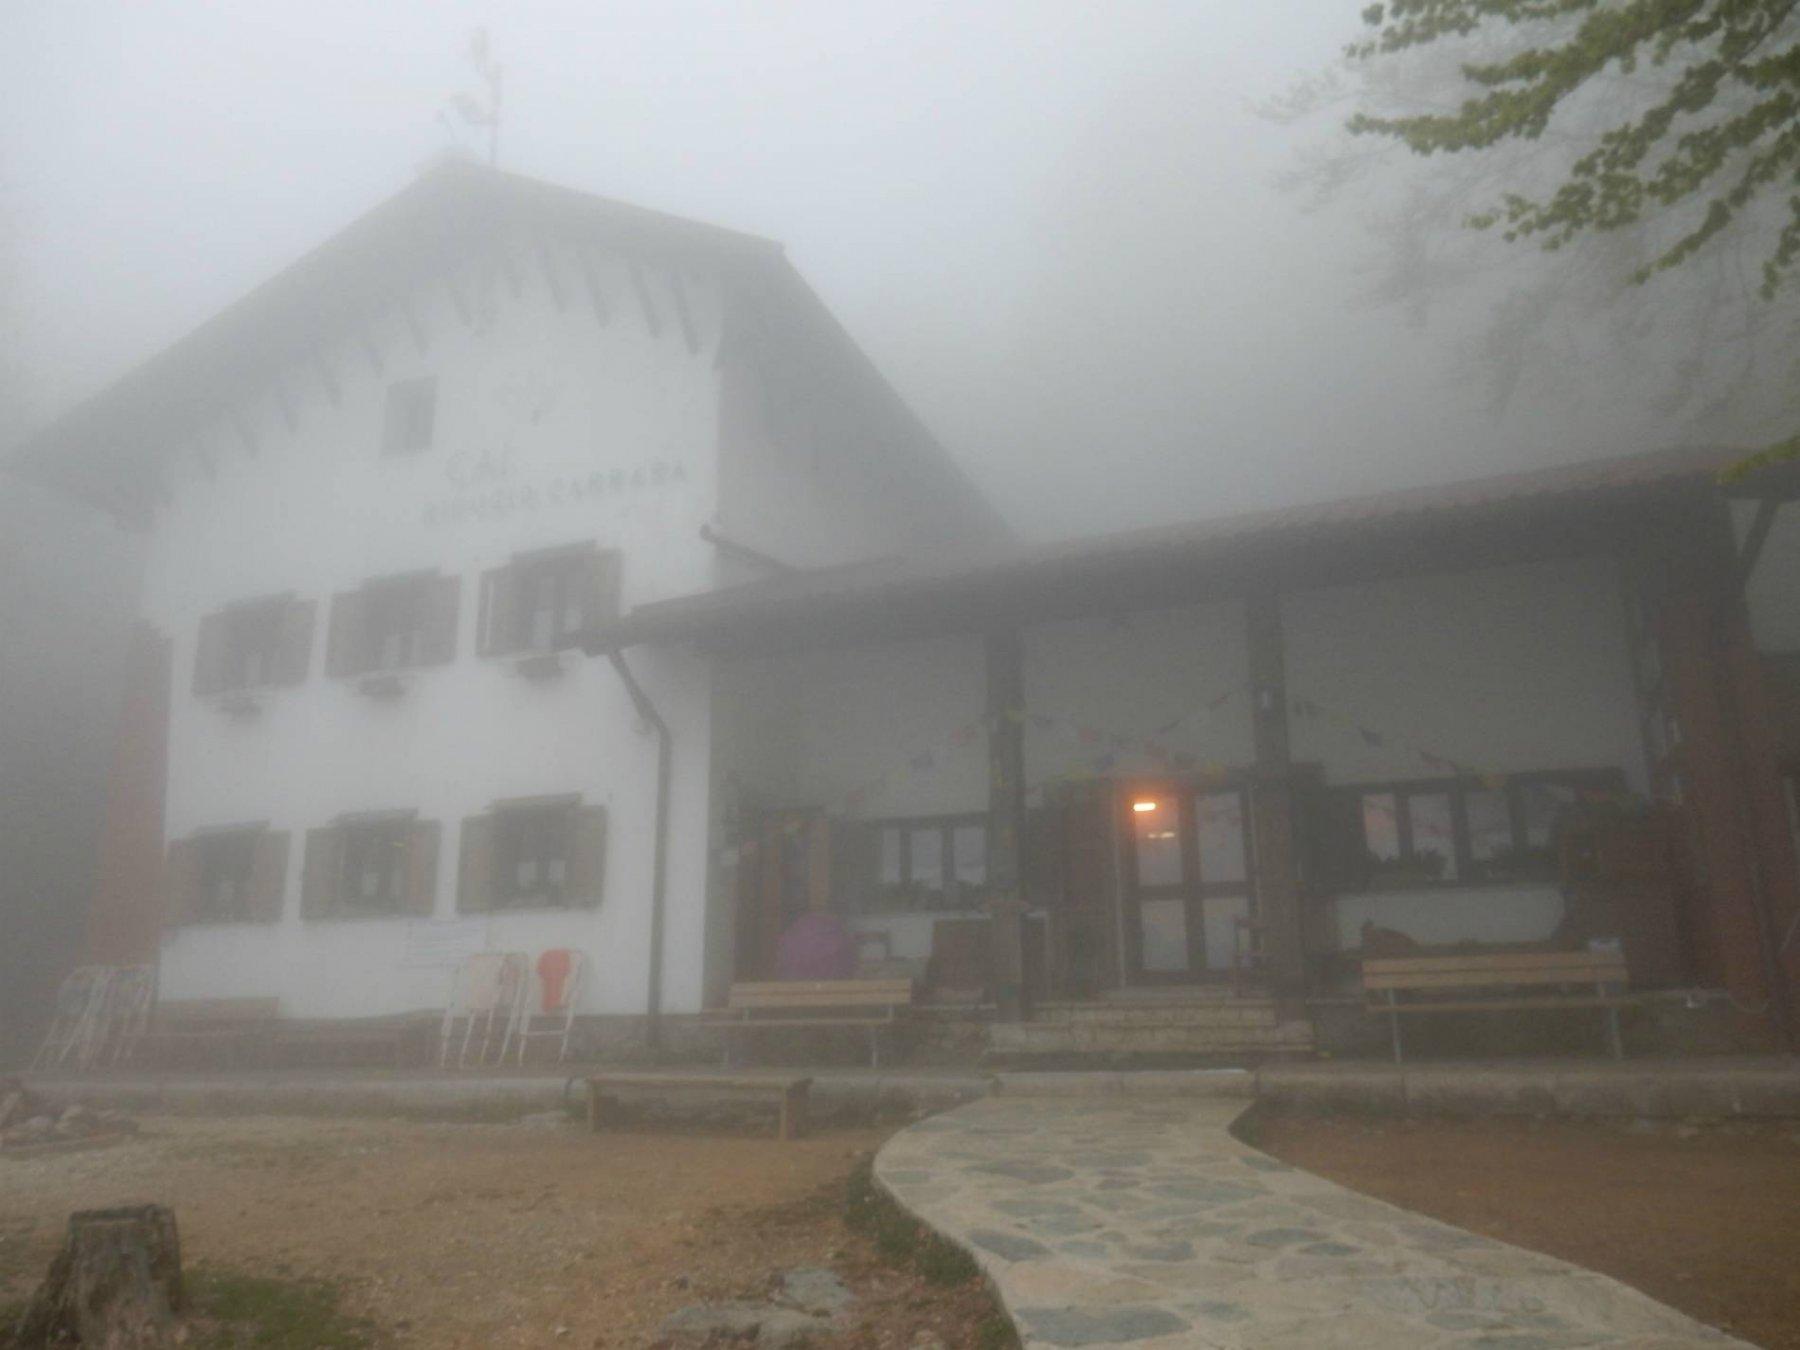 Arriviamo al Rif.Carrara in piena nebbia.